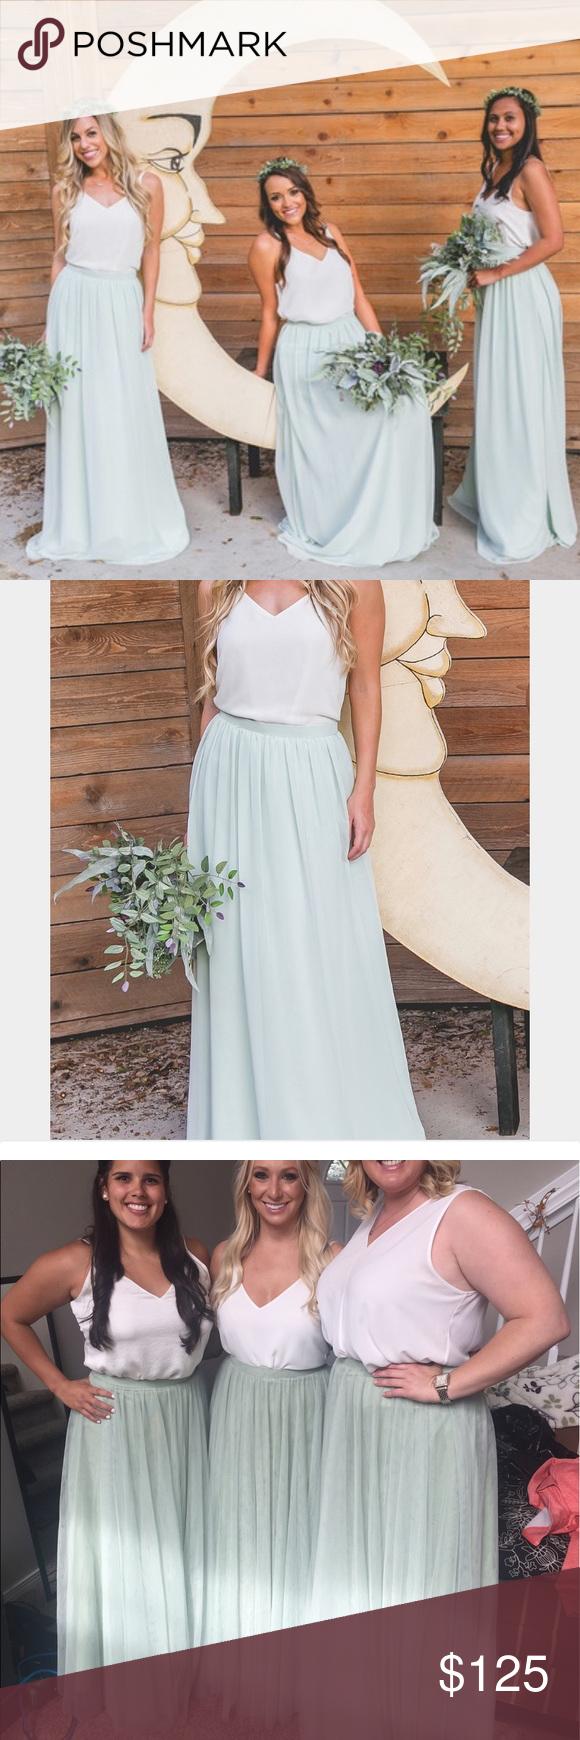 Wedding dress donation  Donating Tomorrow Host Pick  Revelry skirt NWT  My Posh Picks